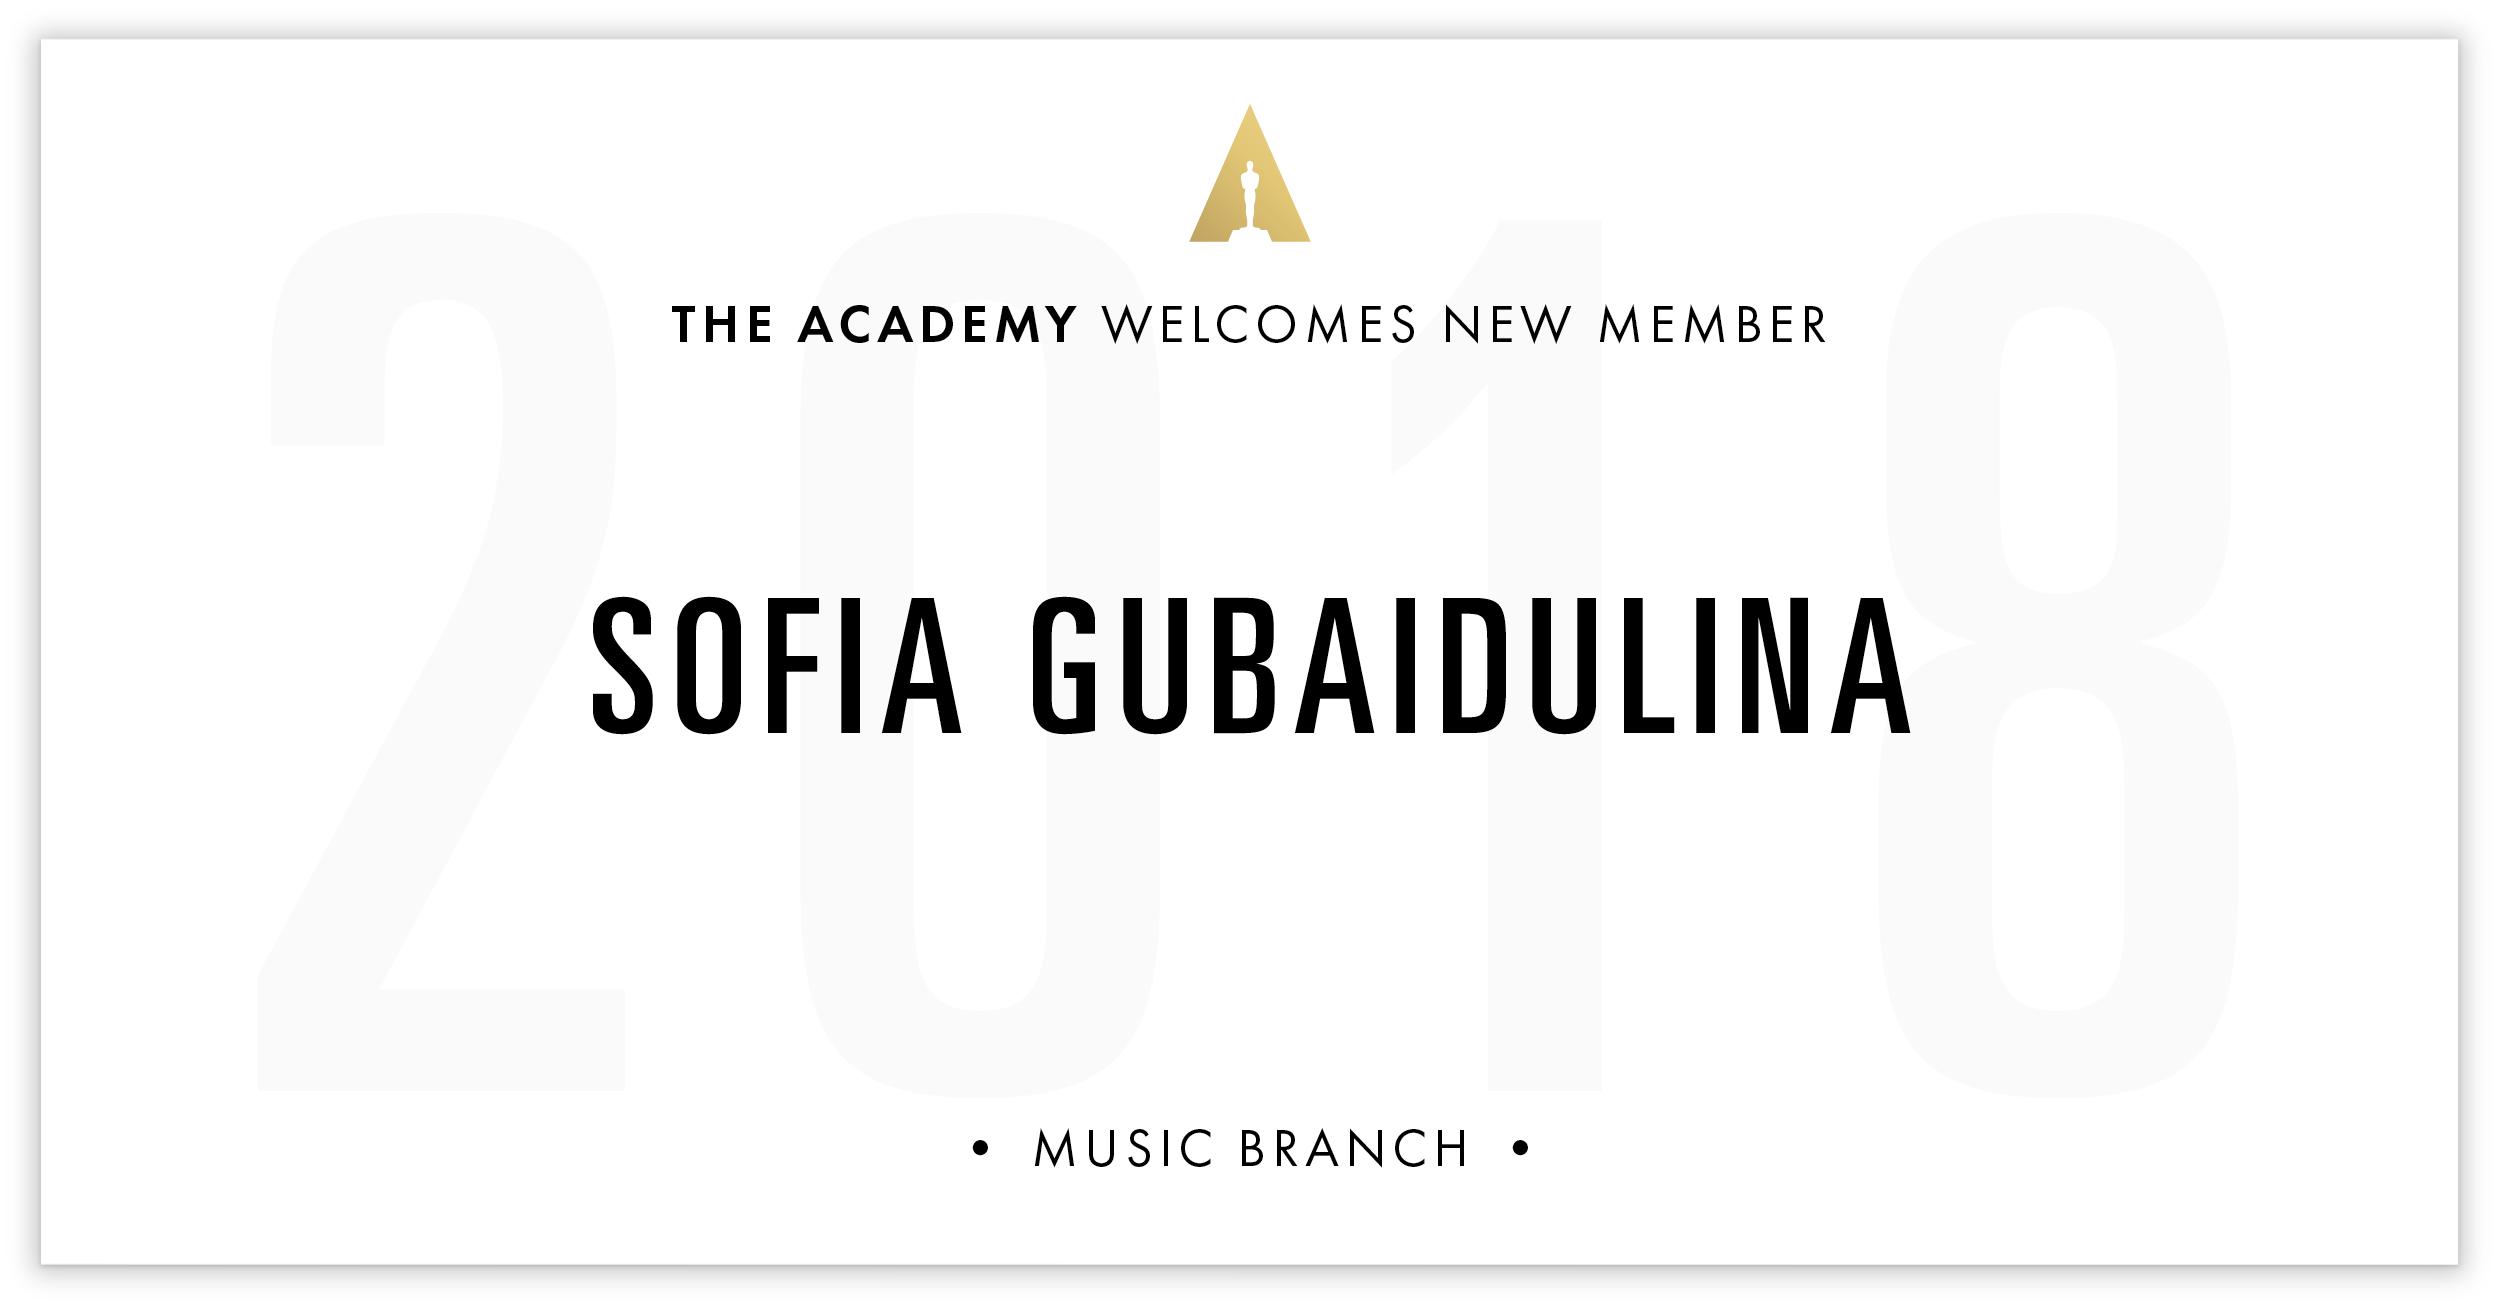 Sofia Gubaidulina is invited!